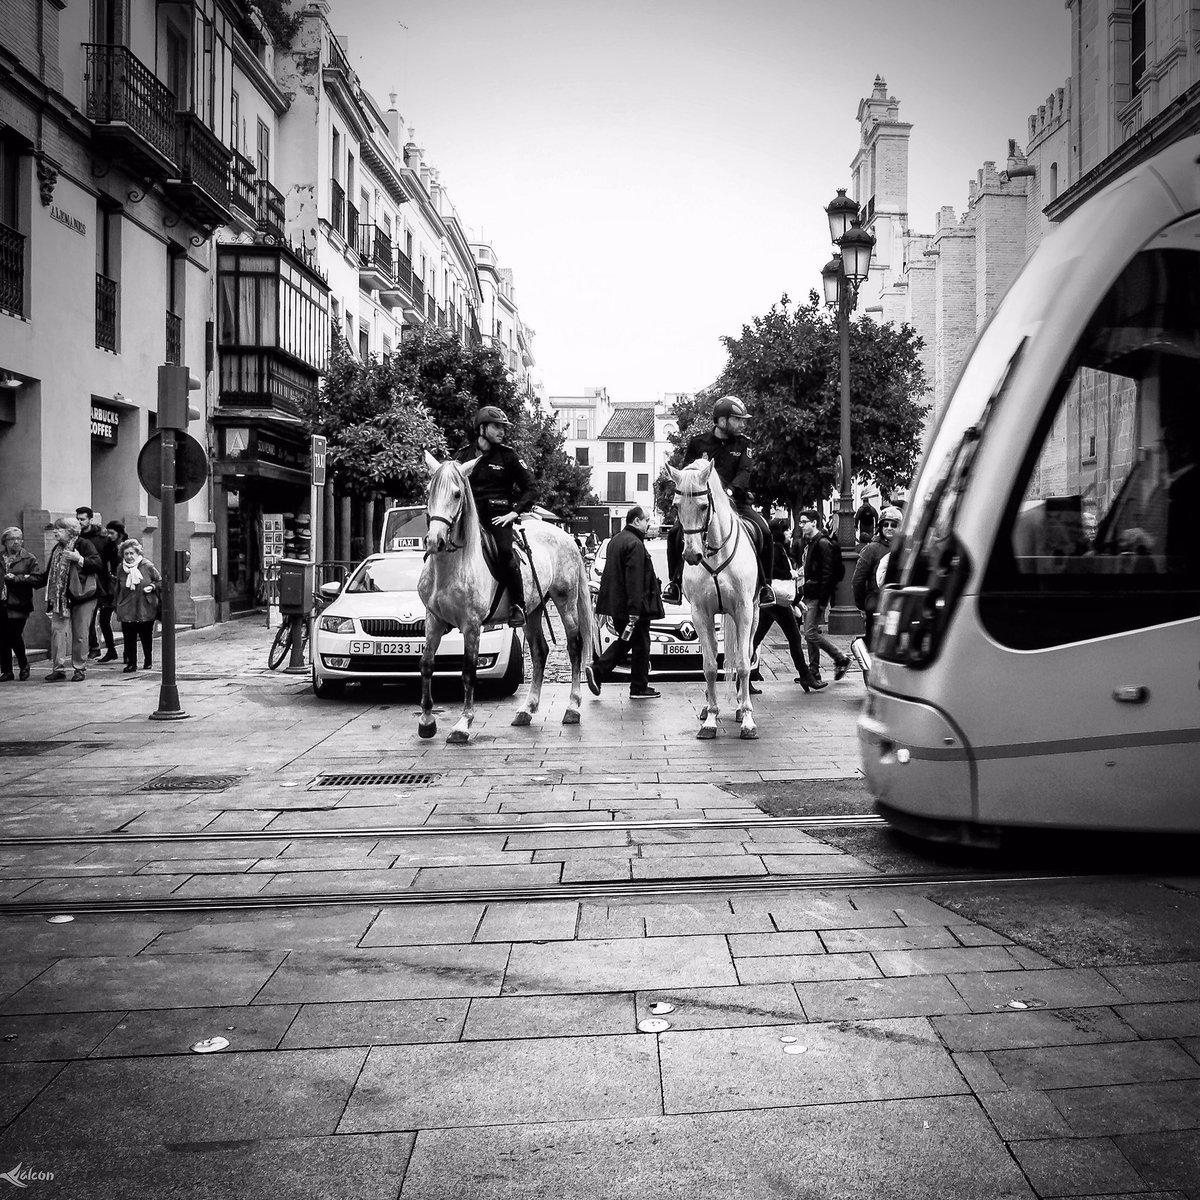 Soledades. #street #streetbw #streetphotography #streetphoto  #retrato #portrait #portraits #alfalcont #alfalcon  #confinados #sevilla #andalucia  #streetbw #blackwiter #blackandwhite #bn #blancoynegro #portrait #portraits #foto #fotocallejera #photo #calle #Nikon #soledades